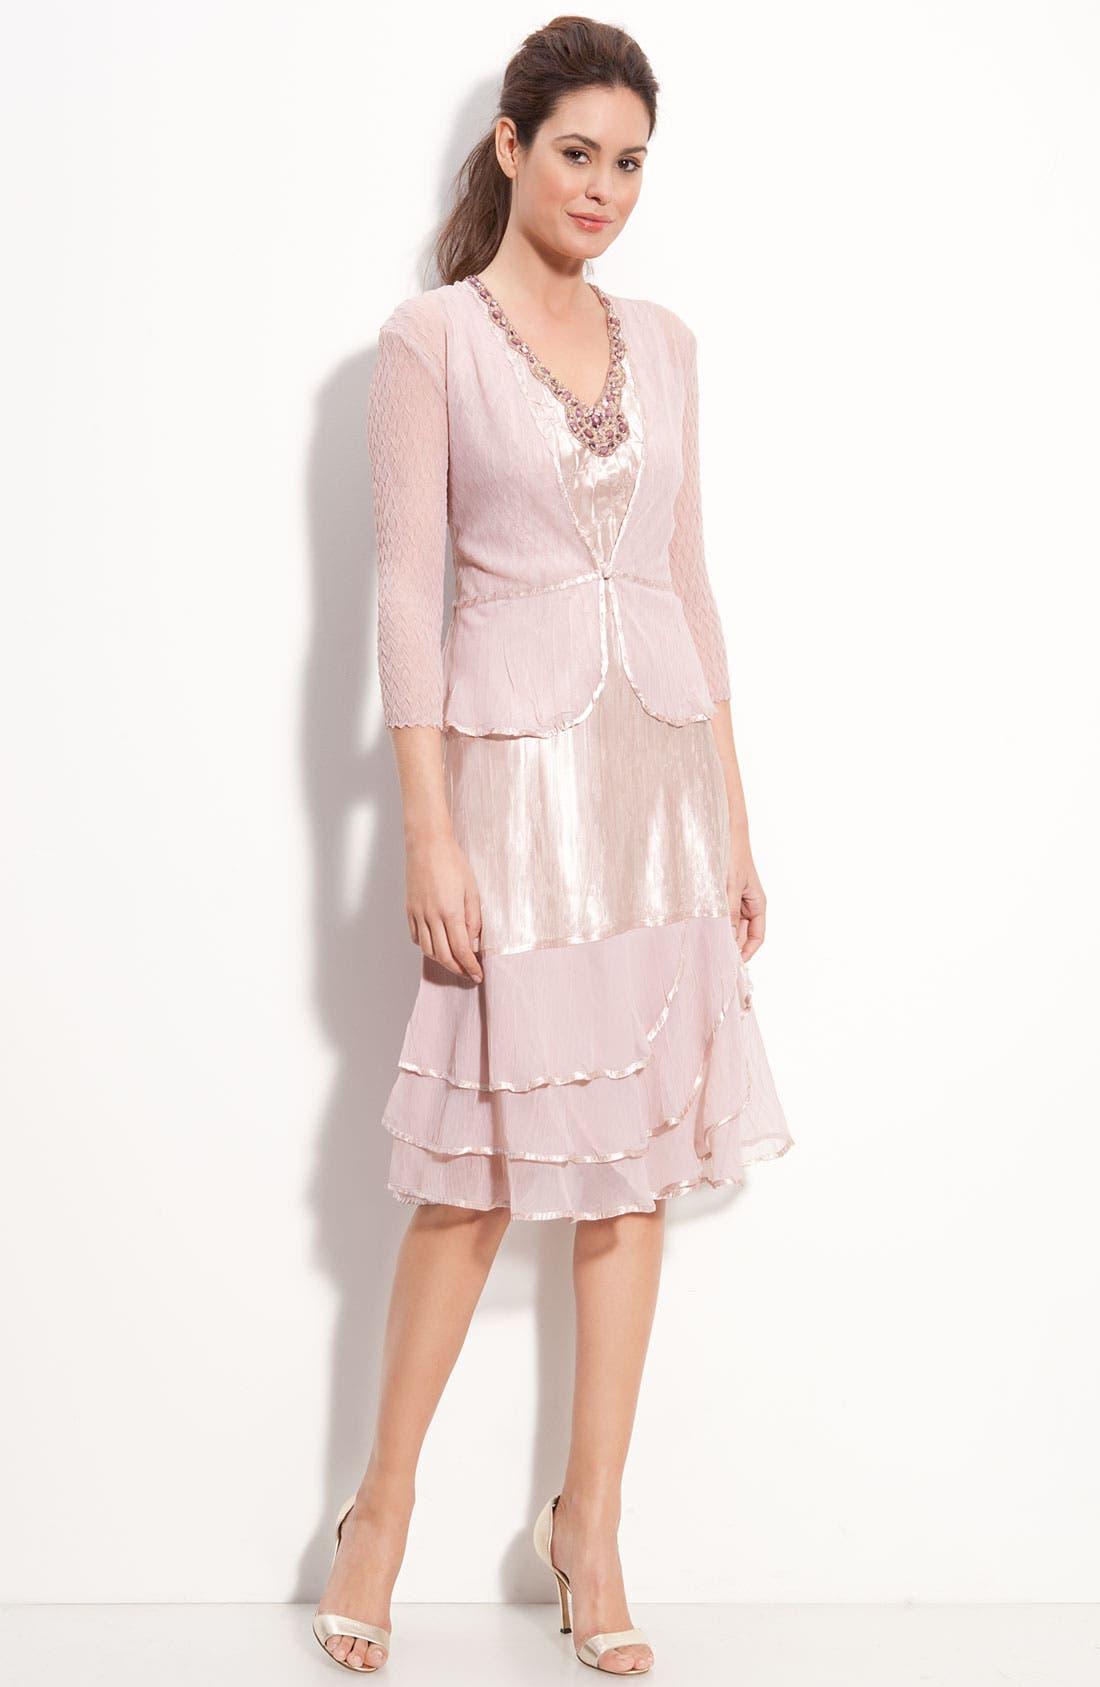 Alternate Image 1 Selected - Komarov Beaded Charmeuse & Chiffon Dress with Jacket